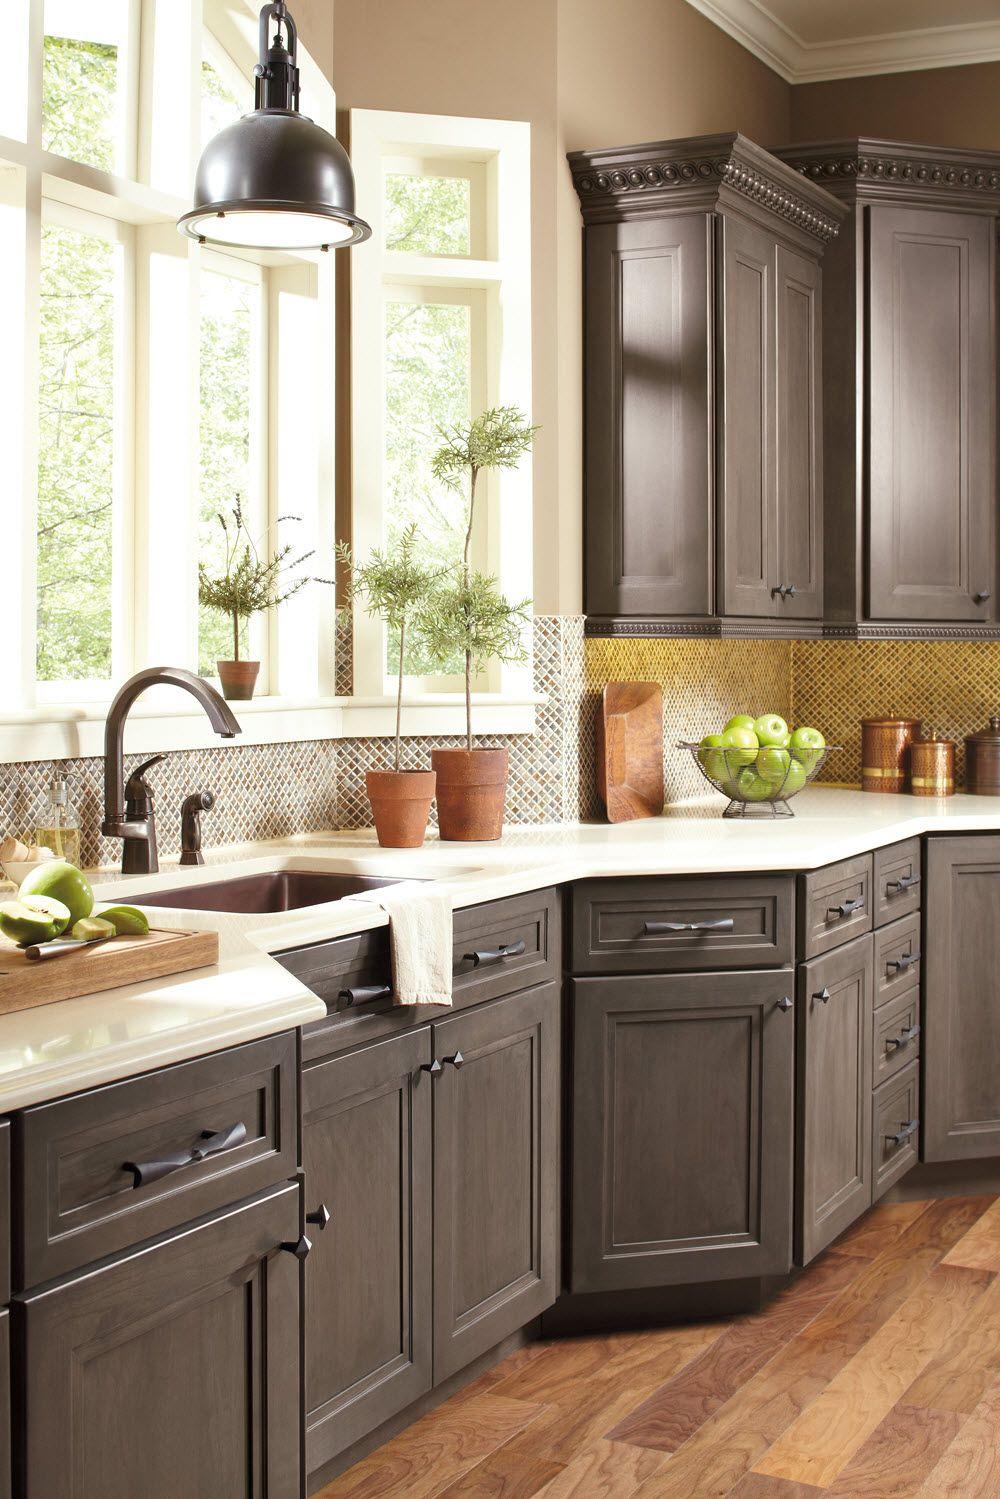 Https Www Hbgdesignbuild Com Kitchen Remodeling Cabinets